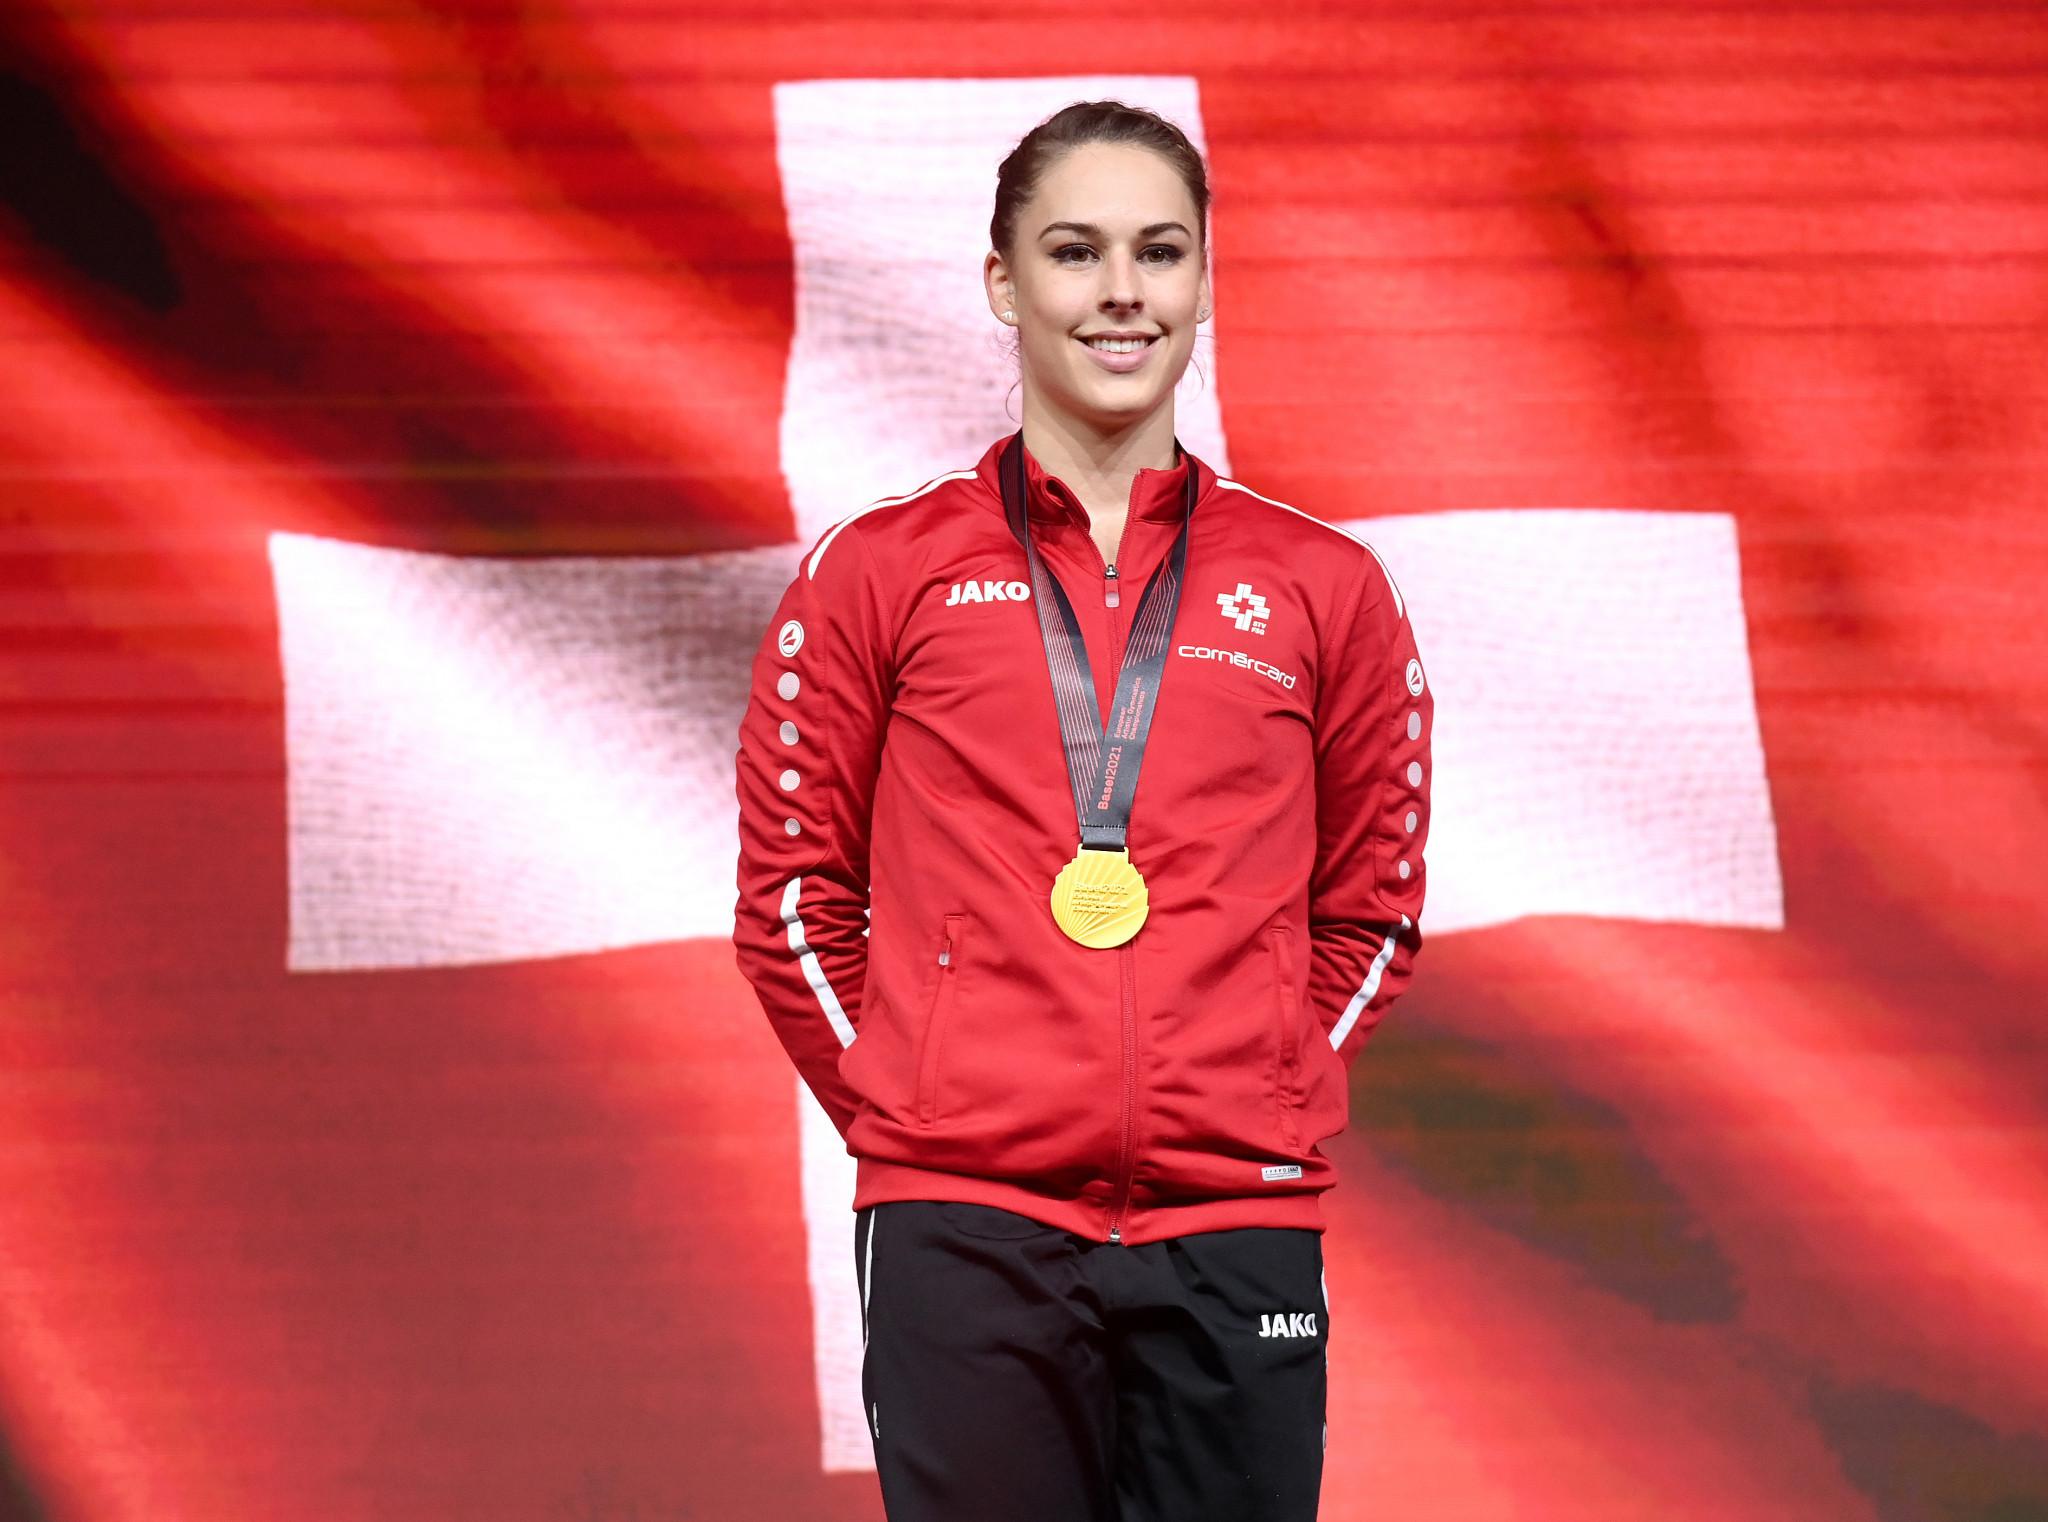 Six-time European champion Steingruber retires from gymnastics post-Tokyo 2020